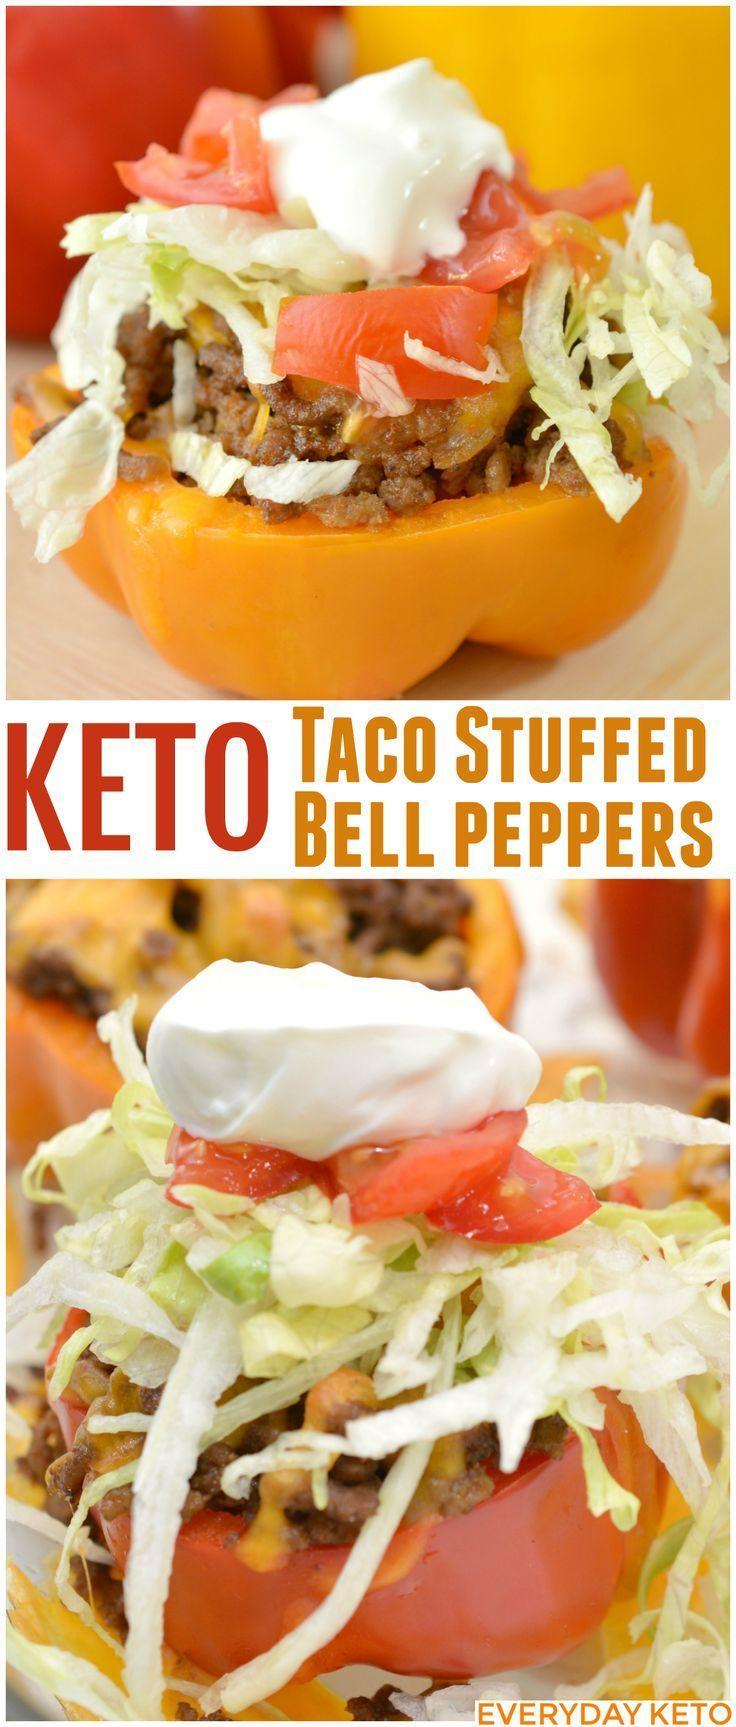 Keto Stuffed Bell Peppers Everyday Ketogenic Recipe Stuffed Peppers Keto Taco Recipes